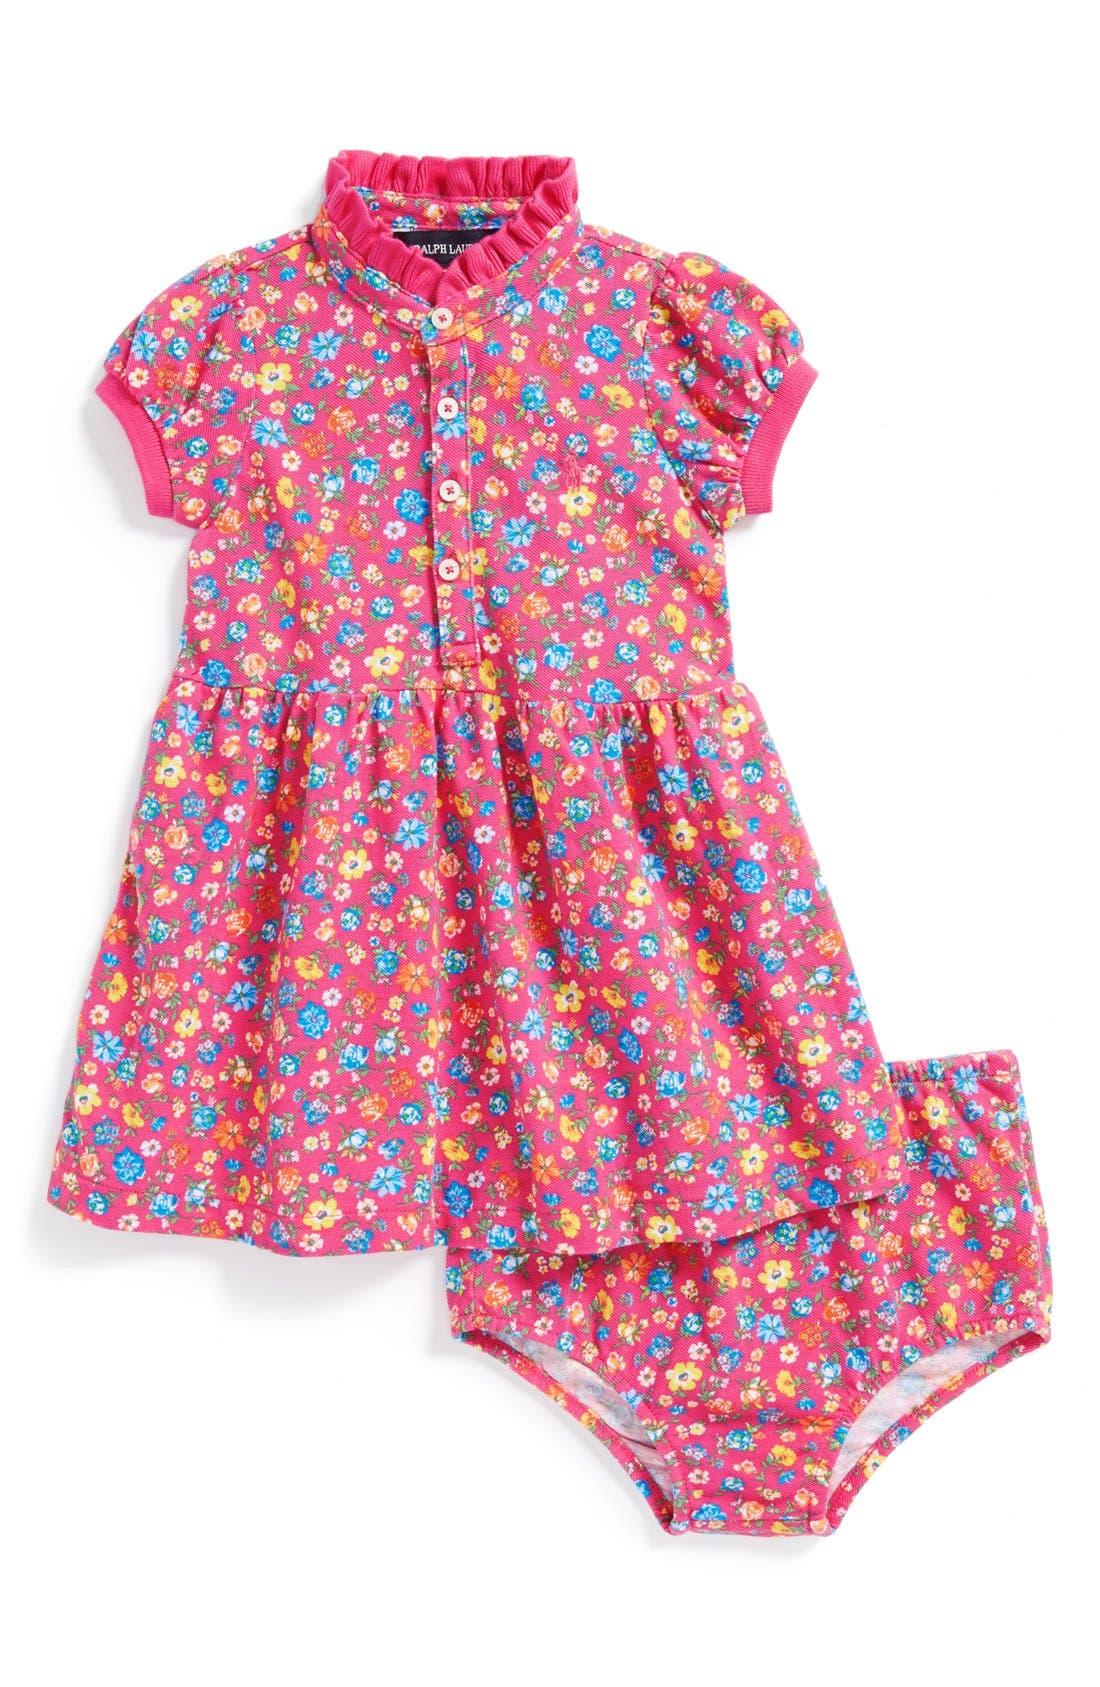 Main Image - Ralph Lauren Floral Mesh Dress & Bloomers (Baby Girls)